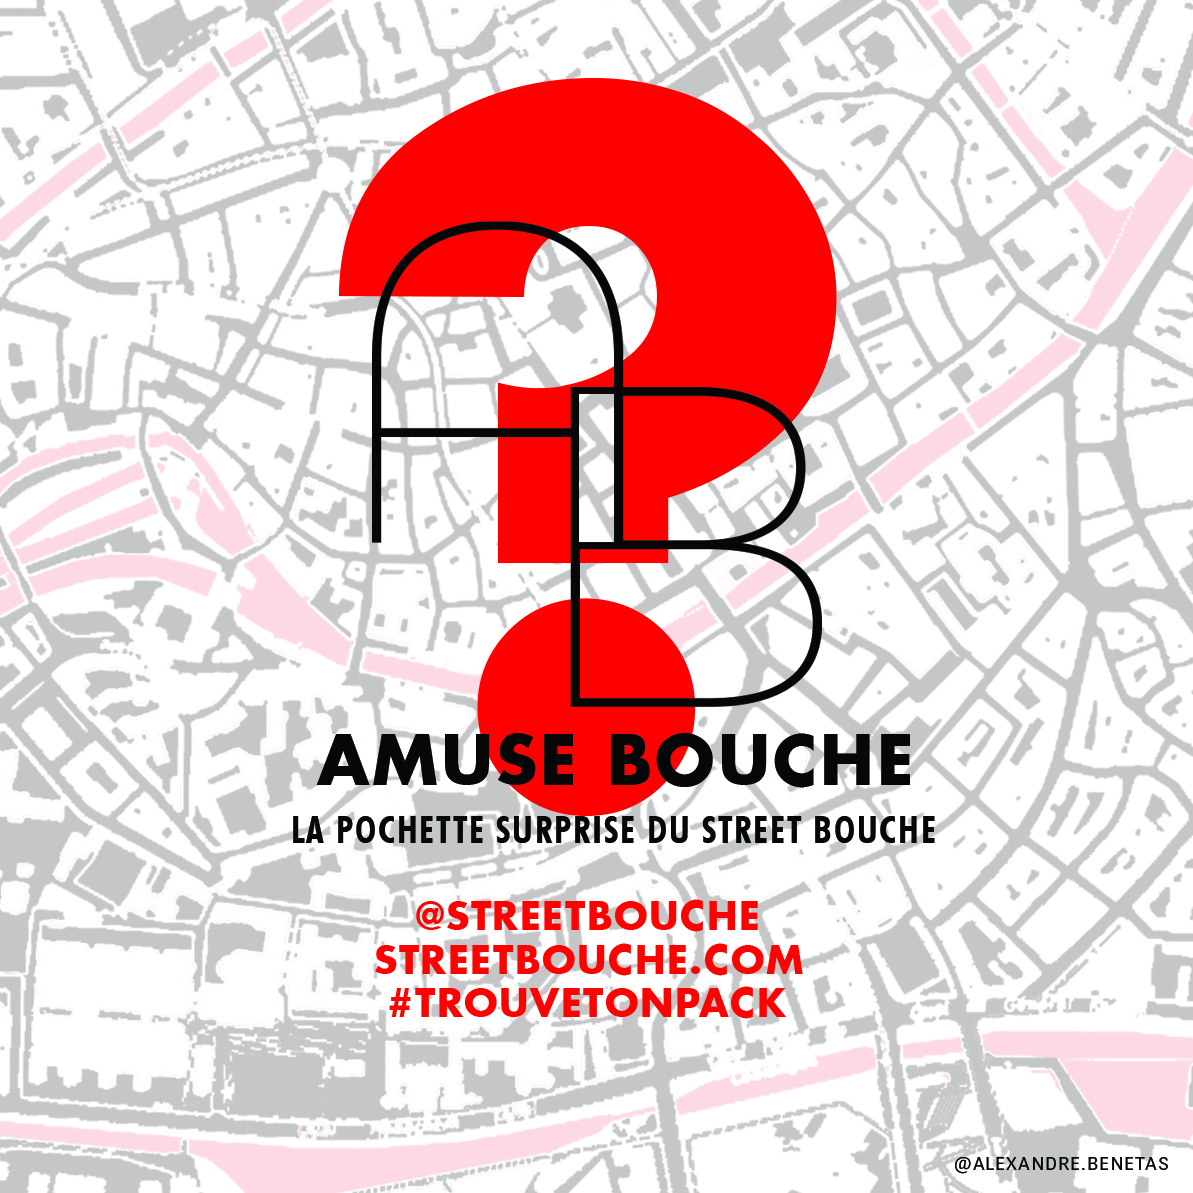 Sticker Amuse Bouche street bouche festival septembre 2018 - Où est mon Amuse Bouche ?